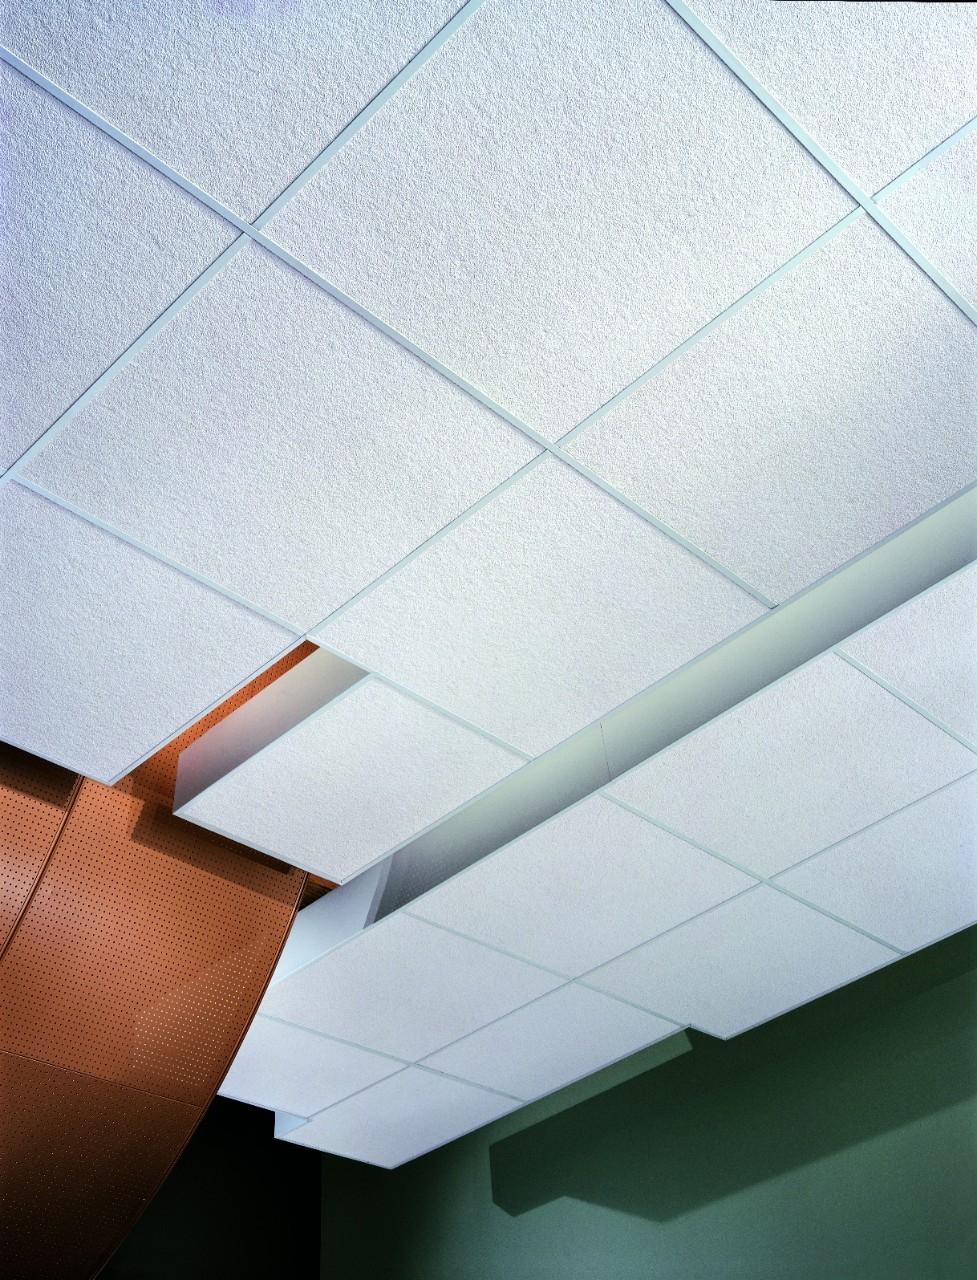 Mylar Faced Ceiling Tiles